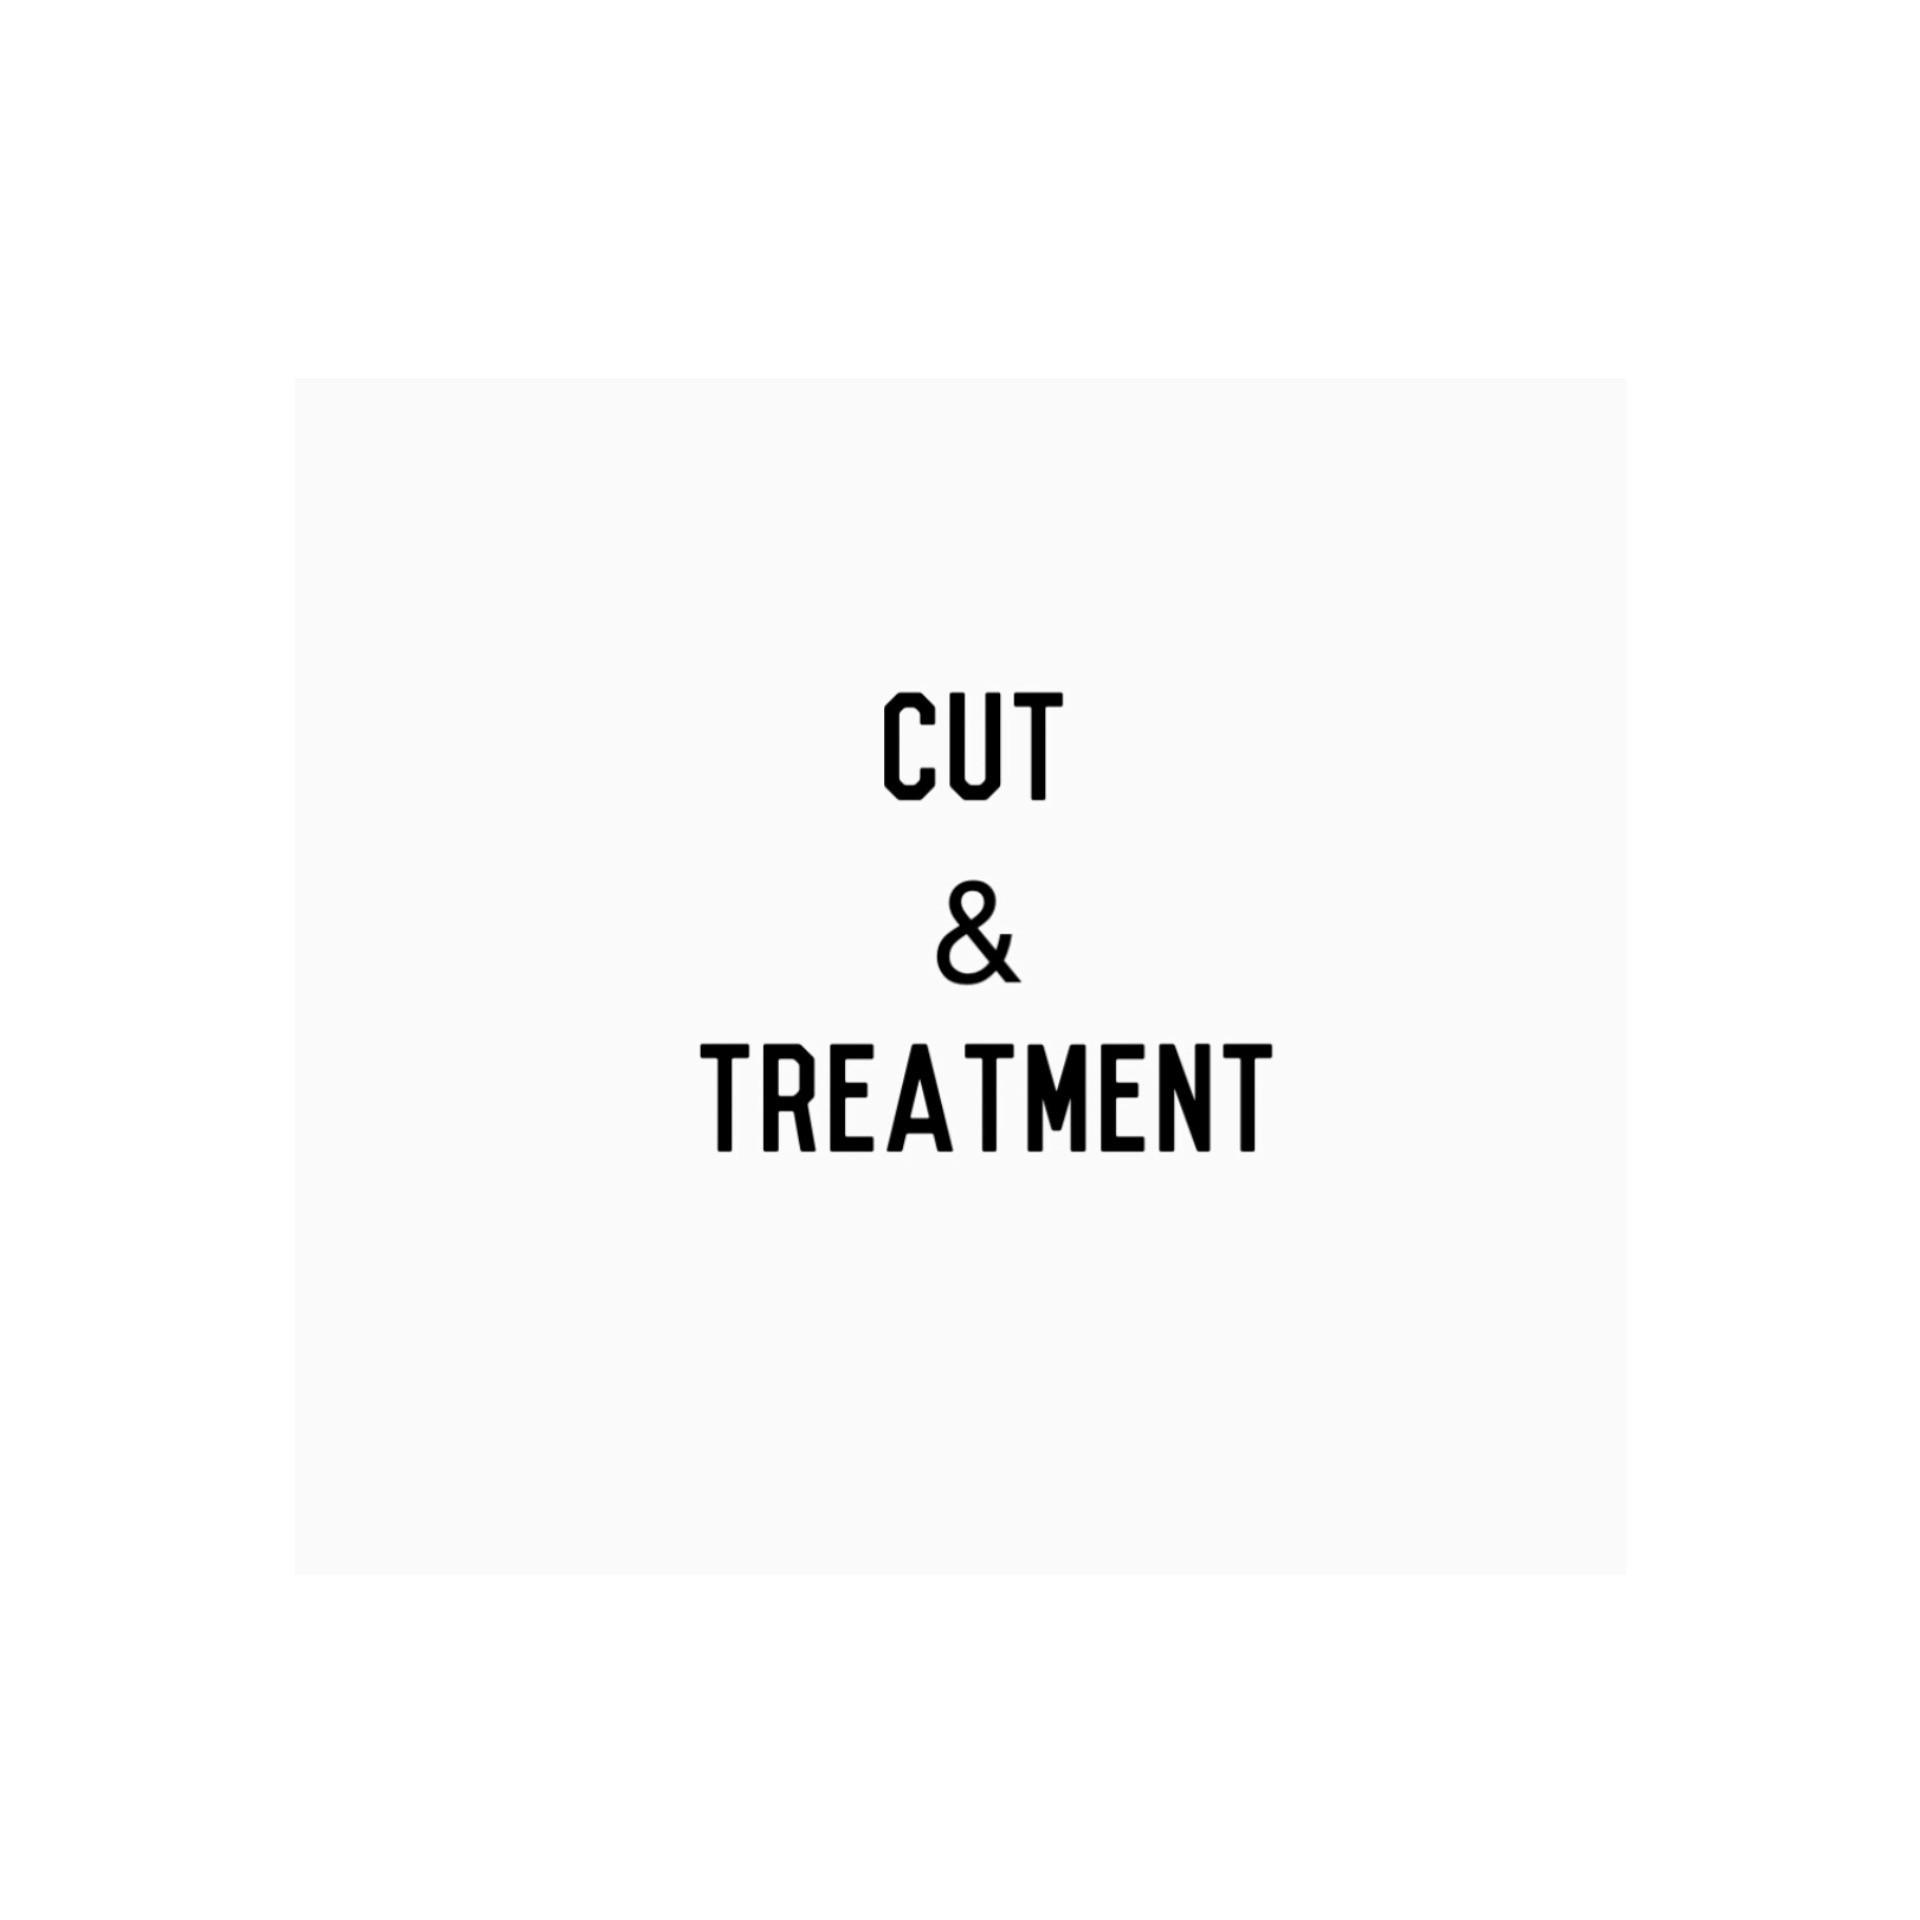 Cut & Treatment